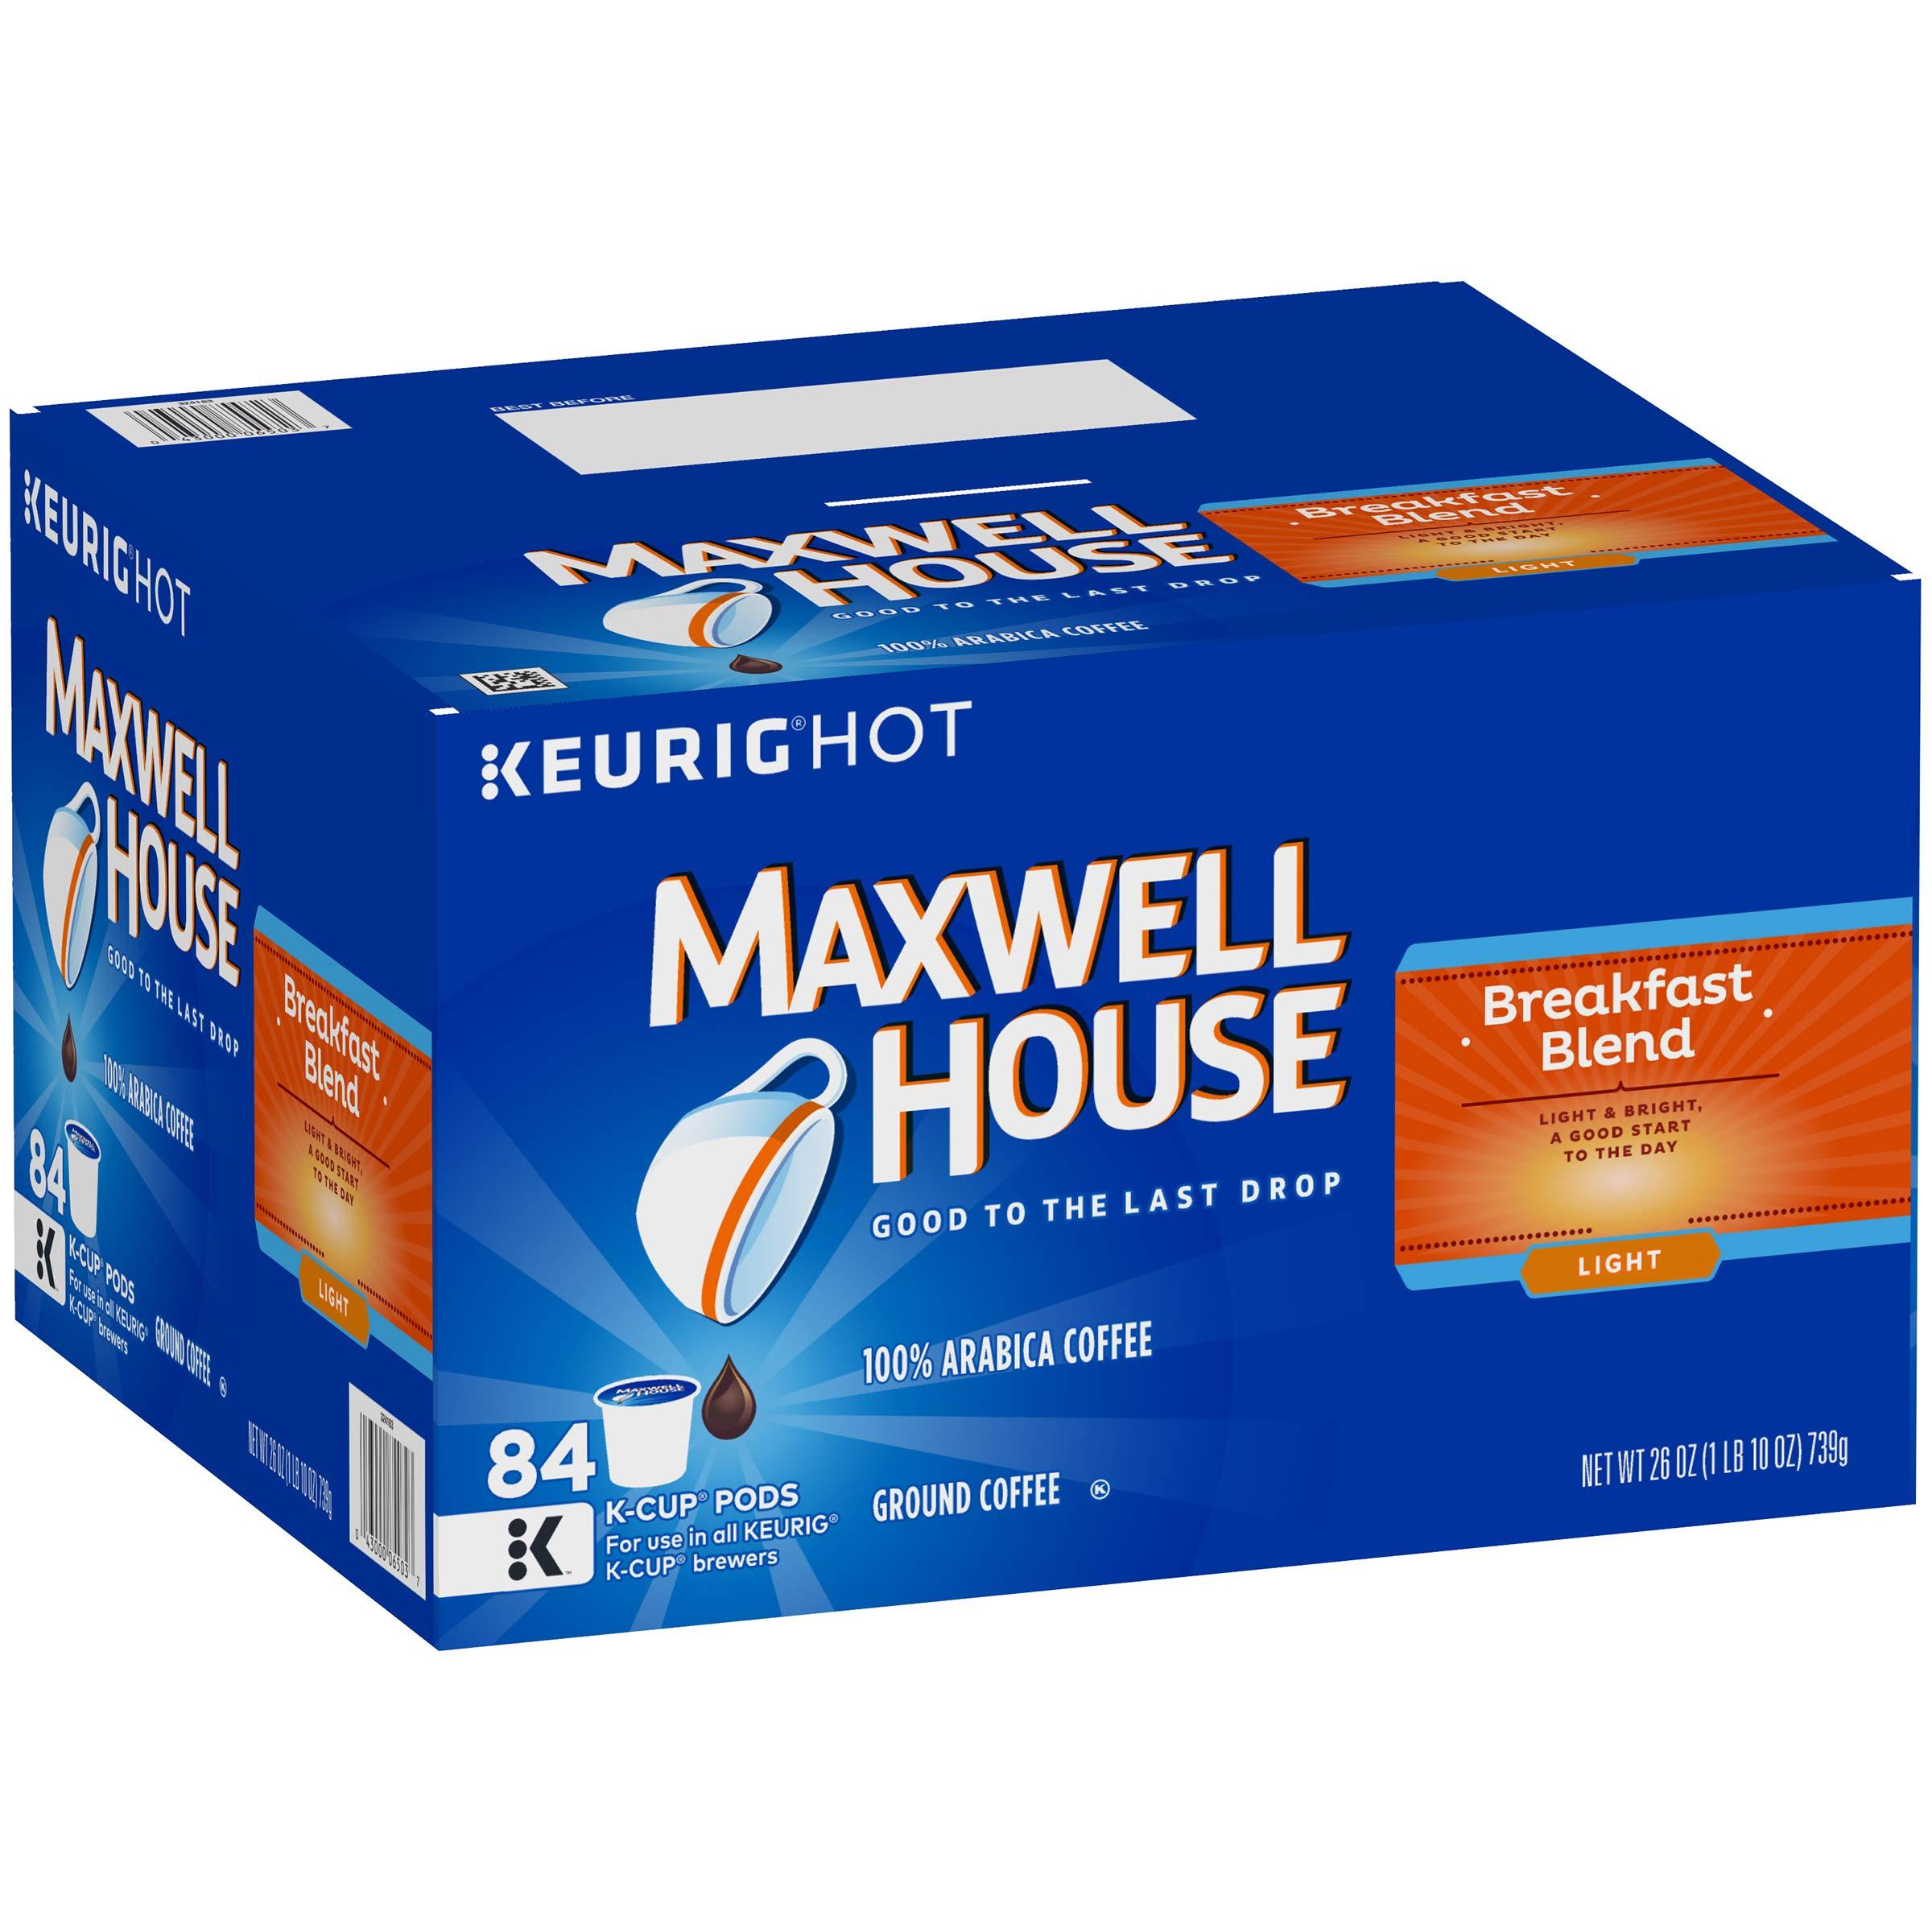 Maxwell House Breakfast Blend Keurig K Cup Coffee Pods, 84 Count